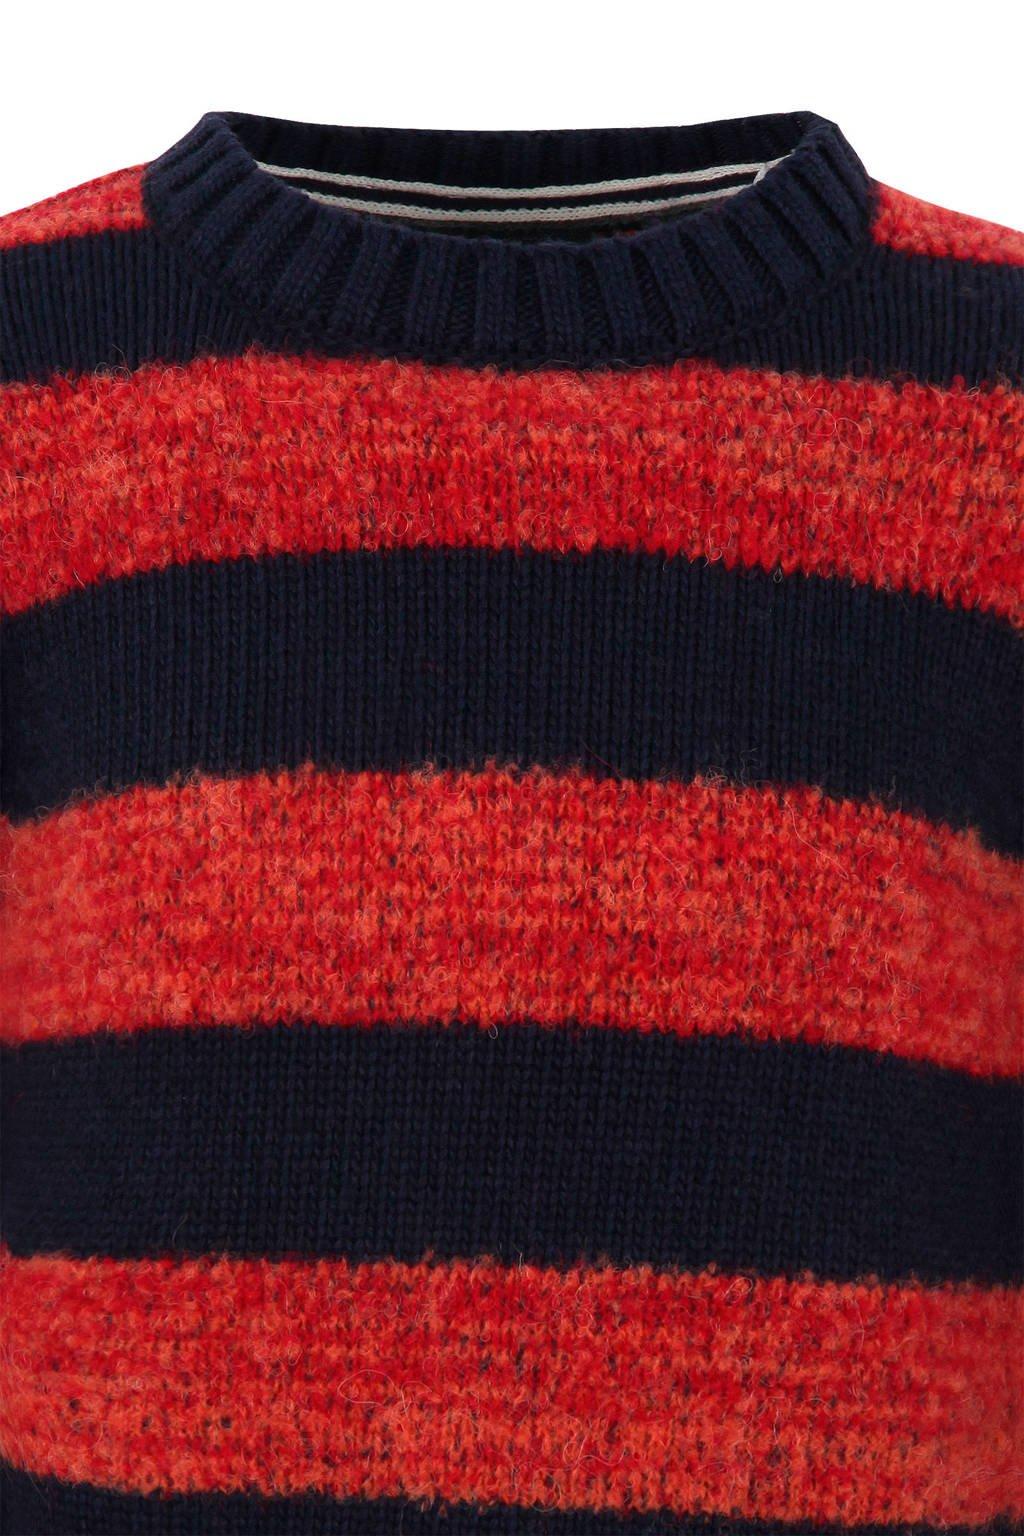 Rood Blauw Gestreepte Trui.Marc O Polo Gestreepte Trui Met Wol Rood Blauw Wehkamp